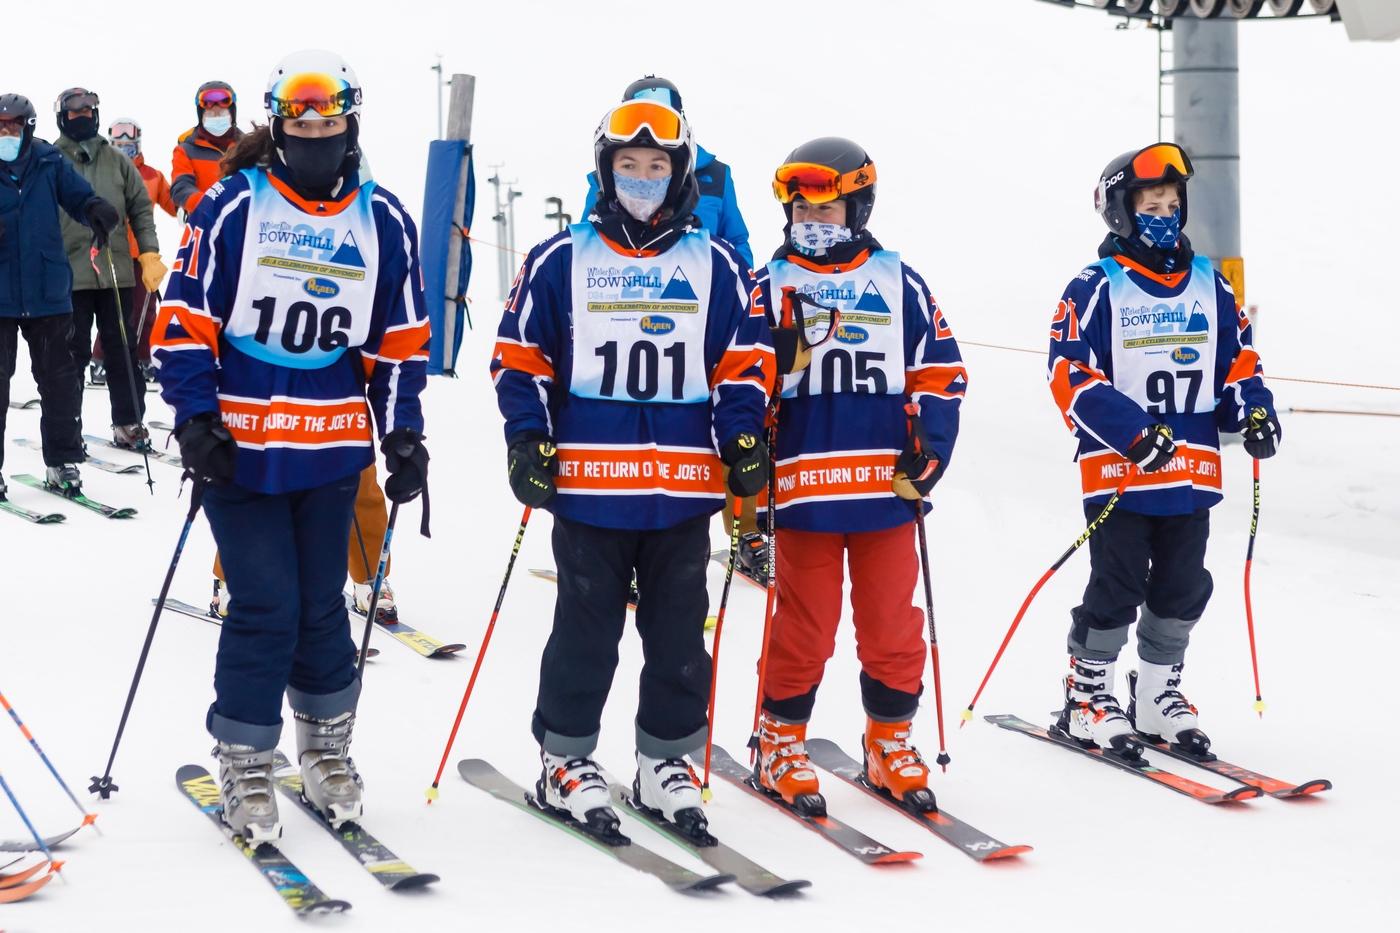 WinterKids Downhill 24 2021 SDP 2690